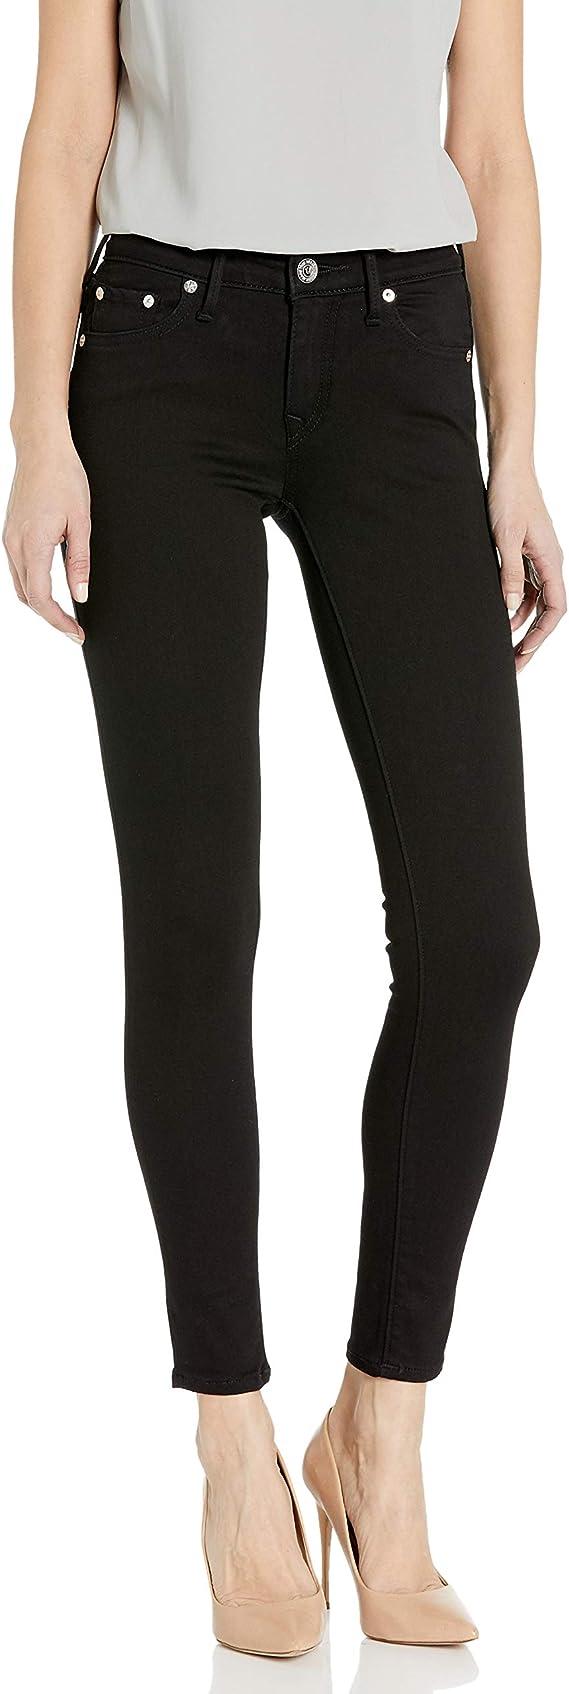 True Religion 真实信仰 Jennie 女式牛仔裤 2.5折$49.94 海淘转运到手约¥399